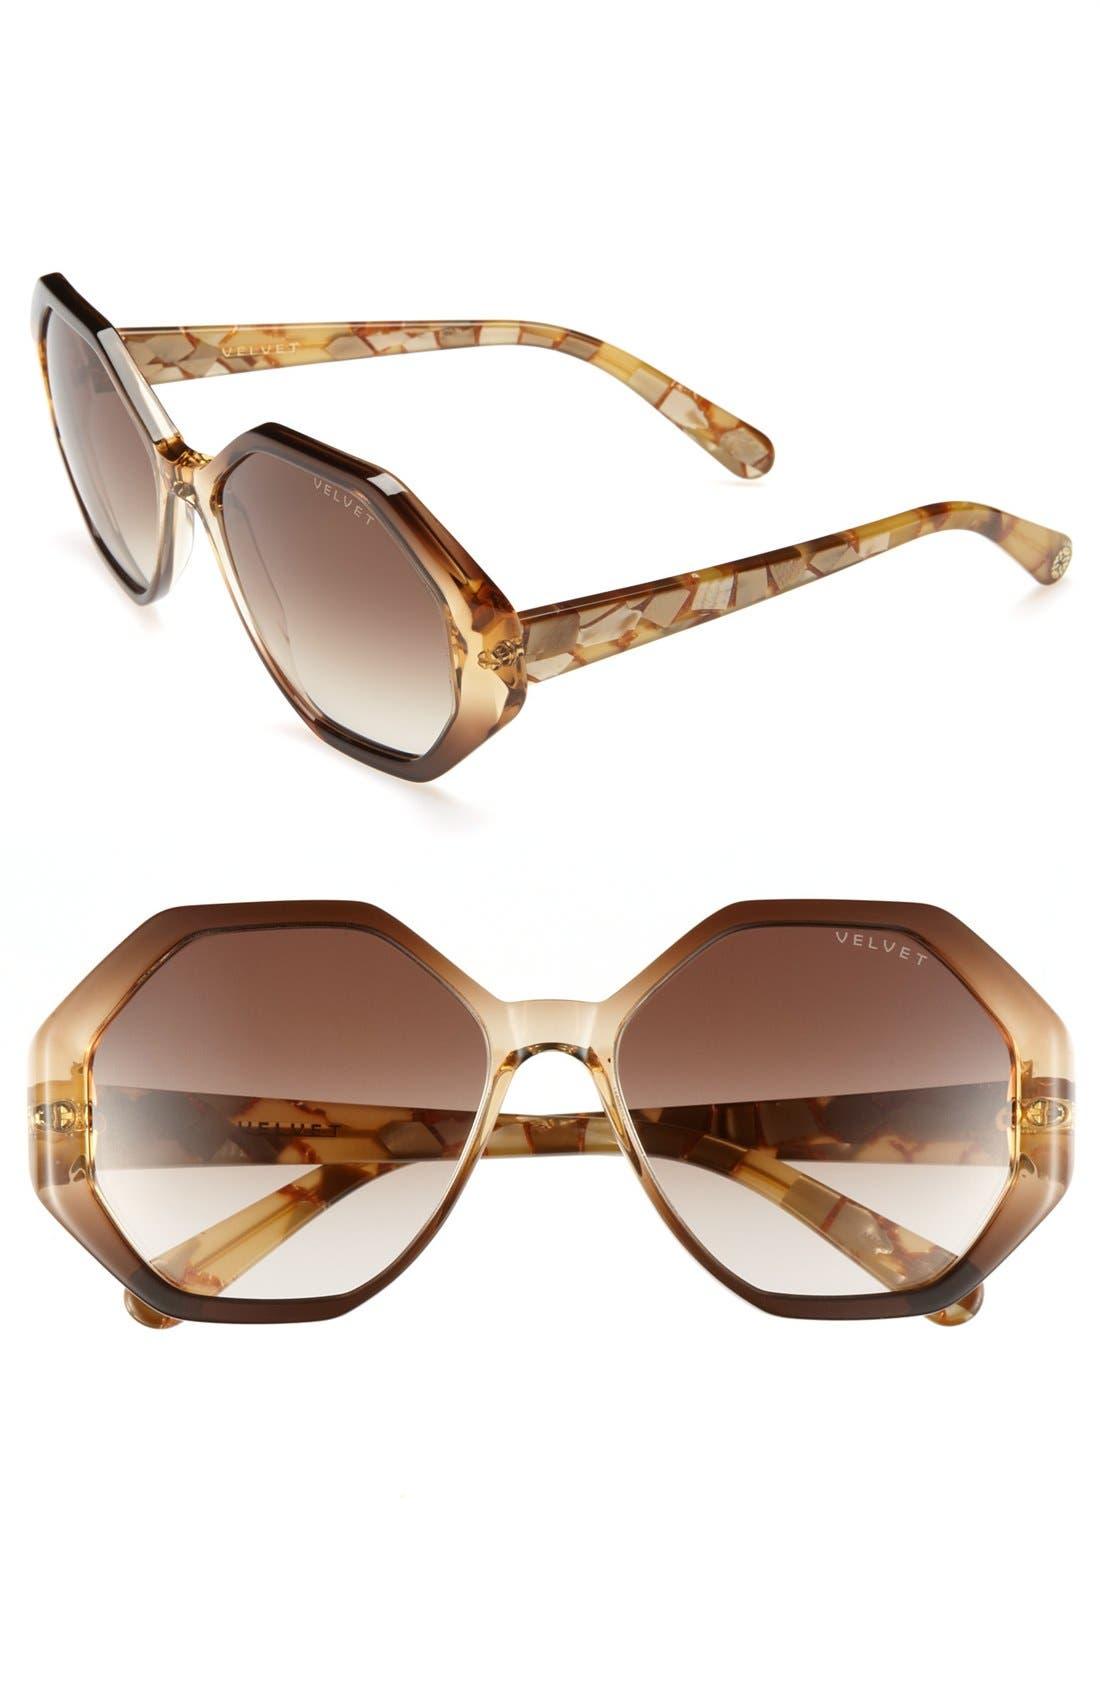 Alternate Image 1 Selected - Velvet Eyewear 'Jami' Sunglasses